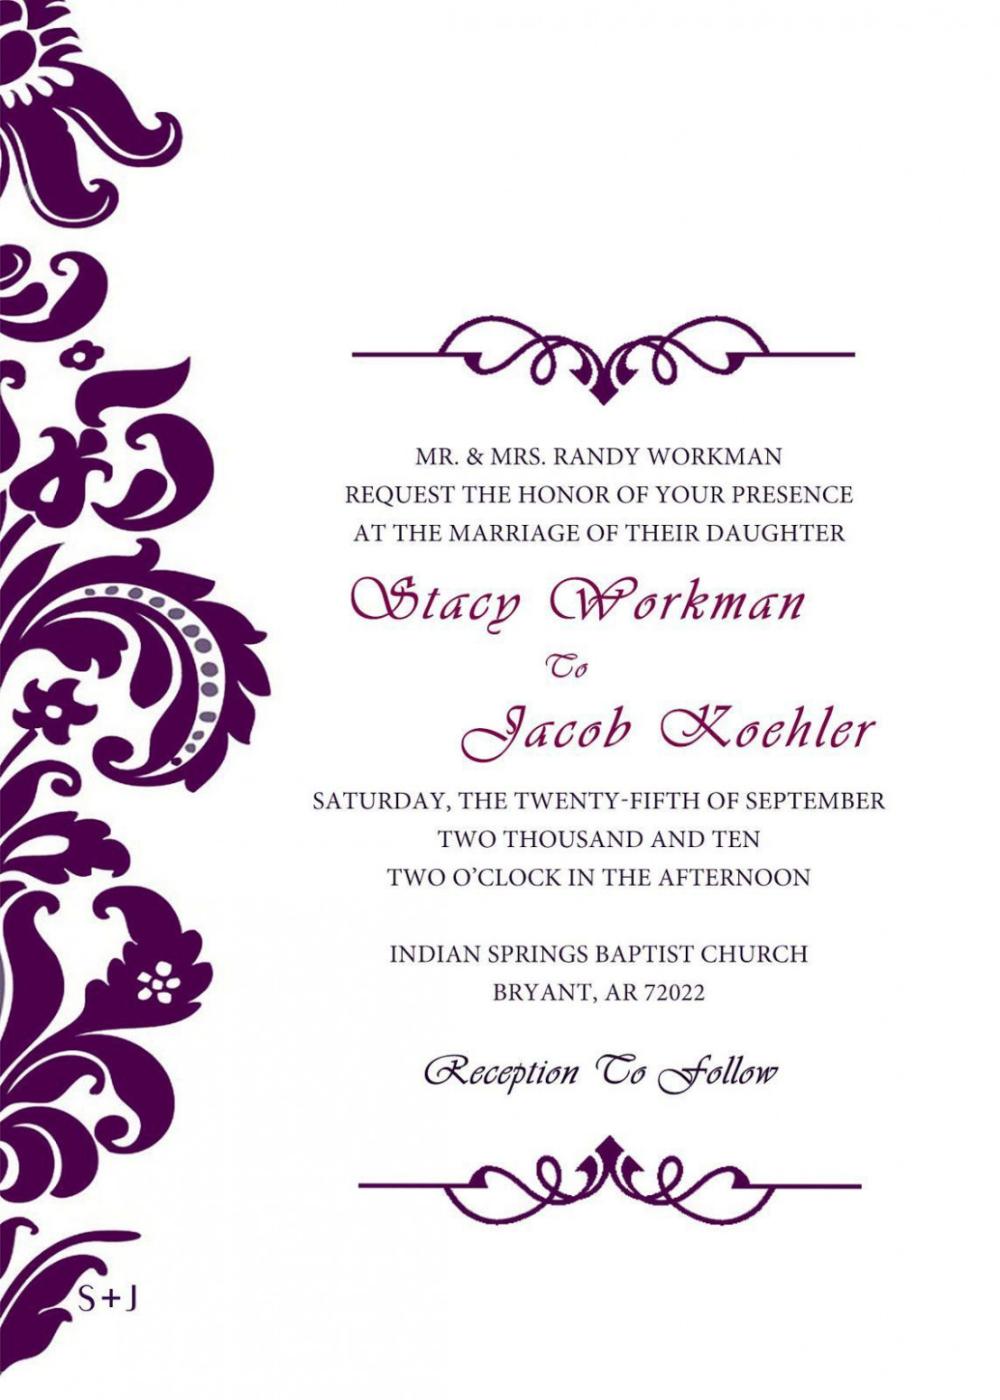 Wedding Invitation Cards Design Online Free Wedding Invitations In 2020 Blank Wedding Invitation Templates Blank Wedding Invitations Wedding Invitation Card Design